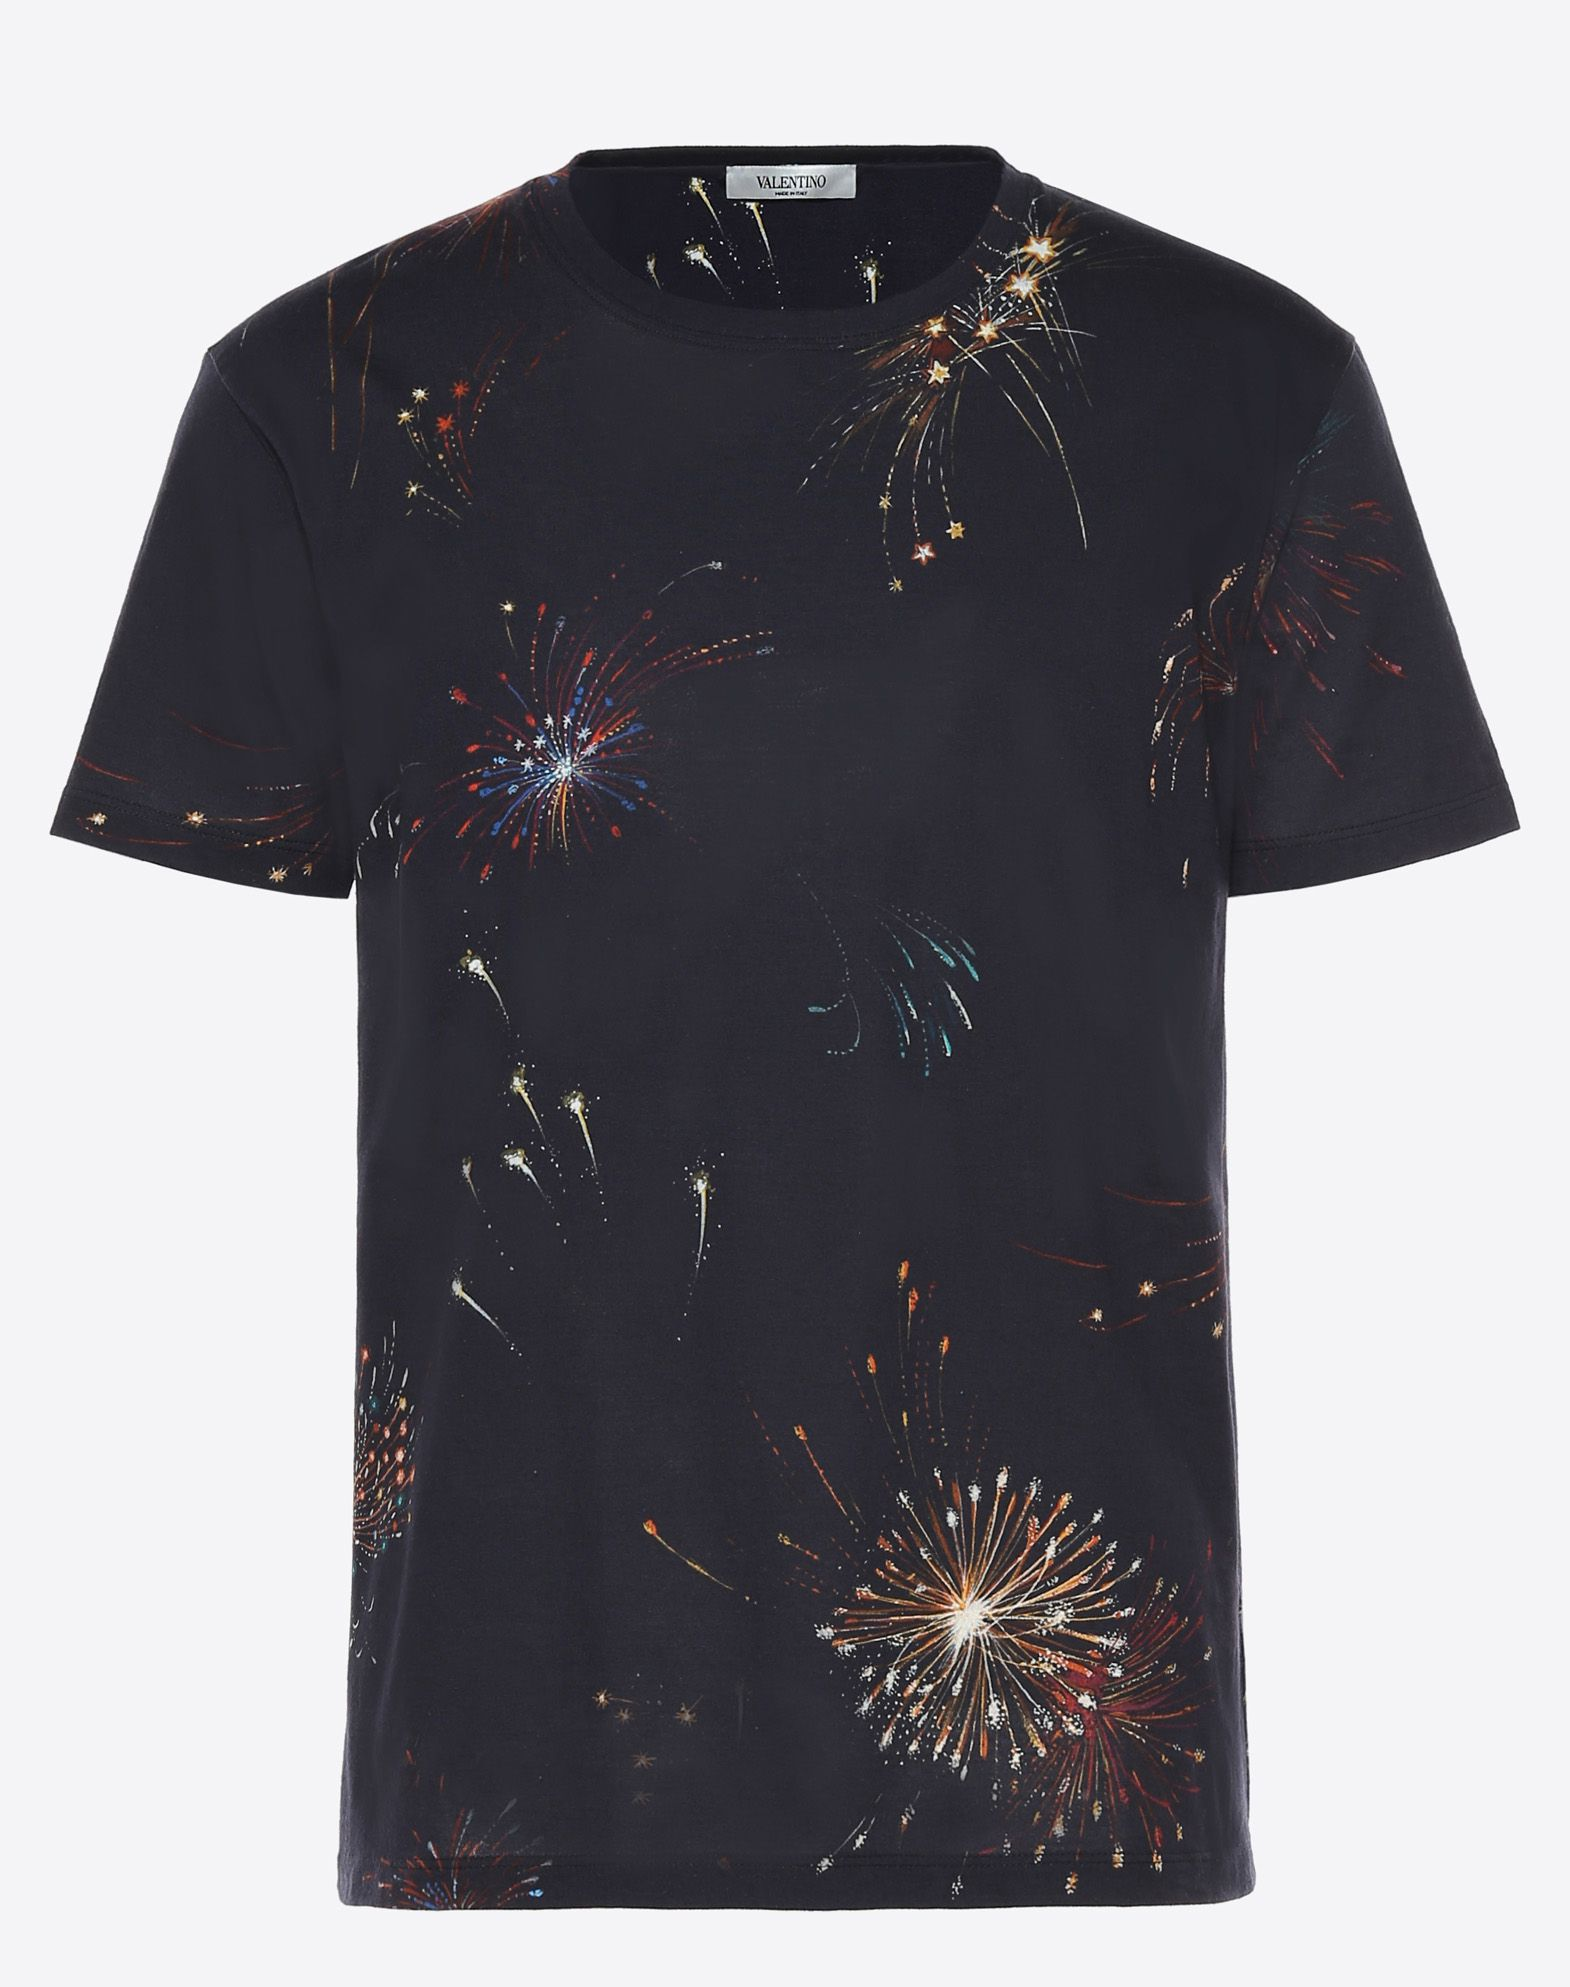 VALENTINO Studs Jersey Round collar Short sleeves  12026770ll